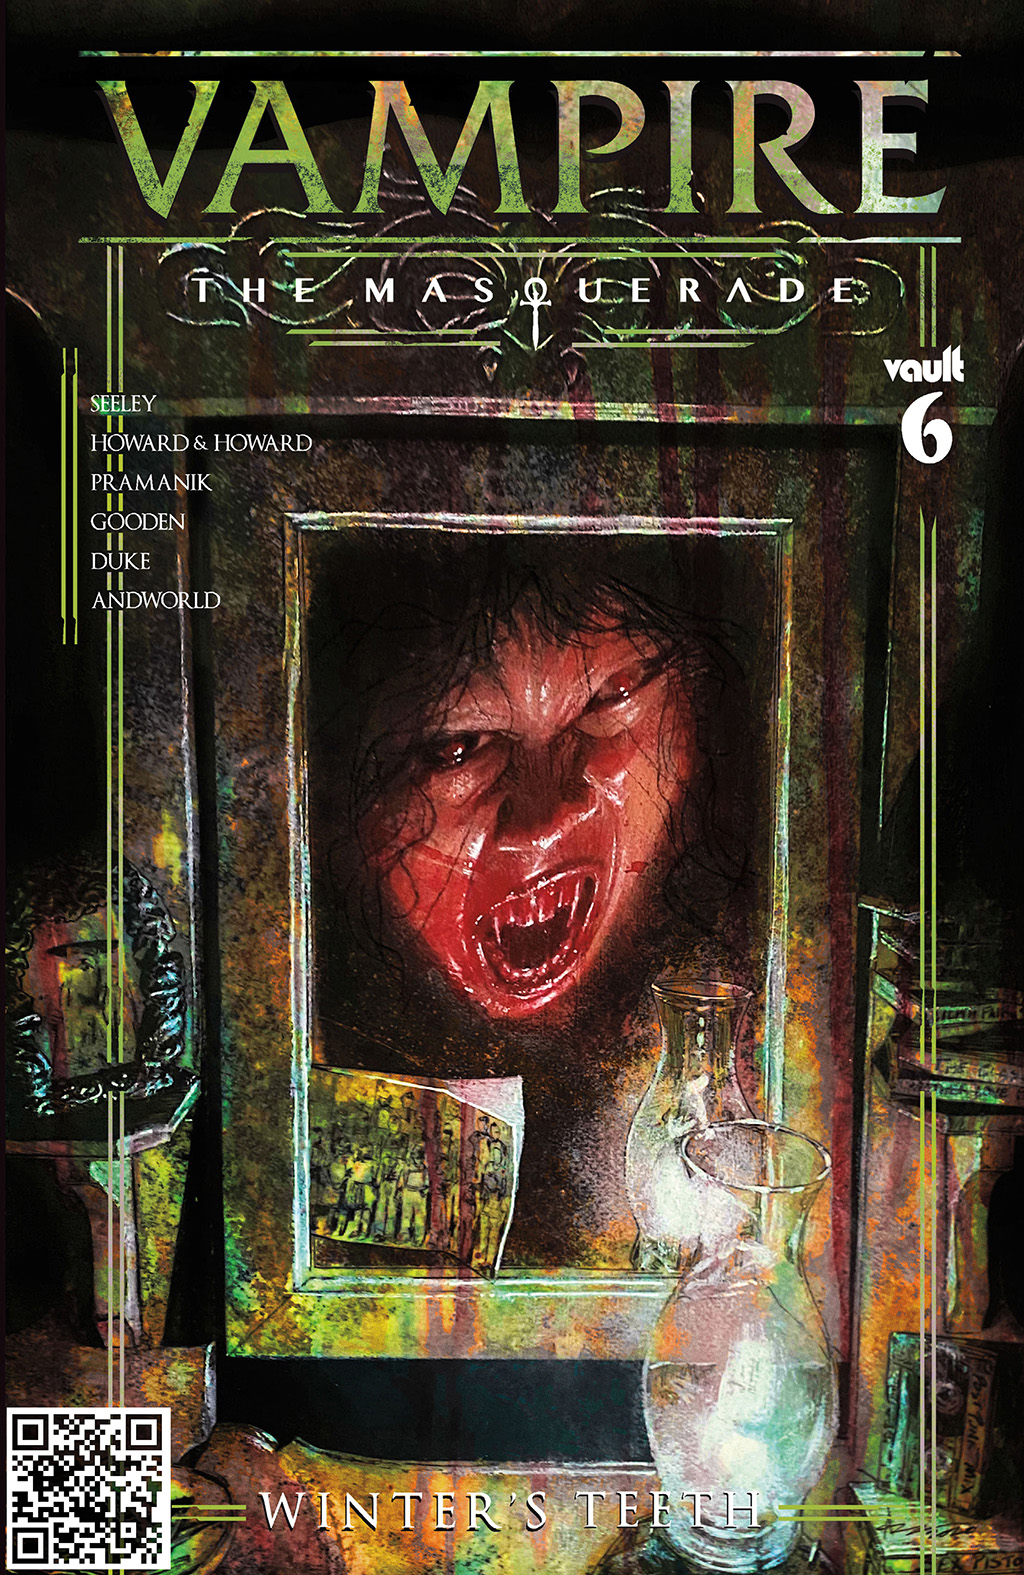 комикс Вампир - Маскарад - Зубы Зимы